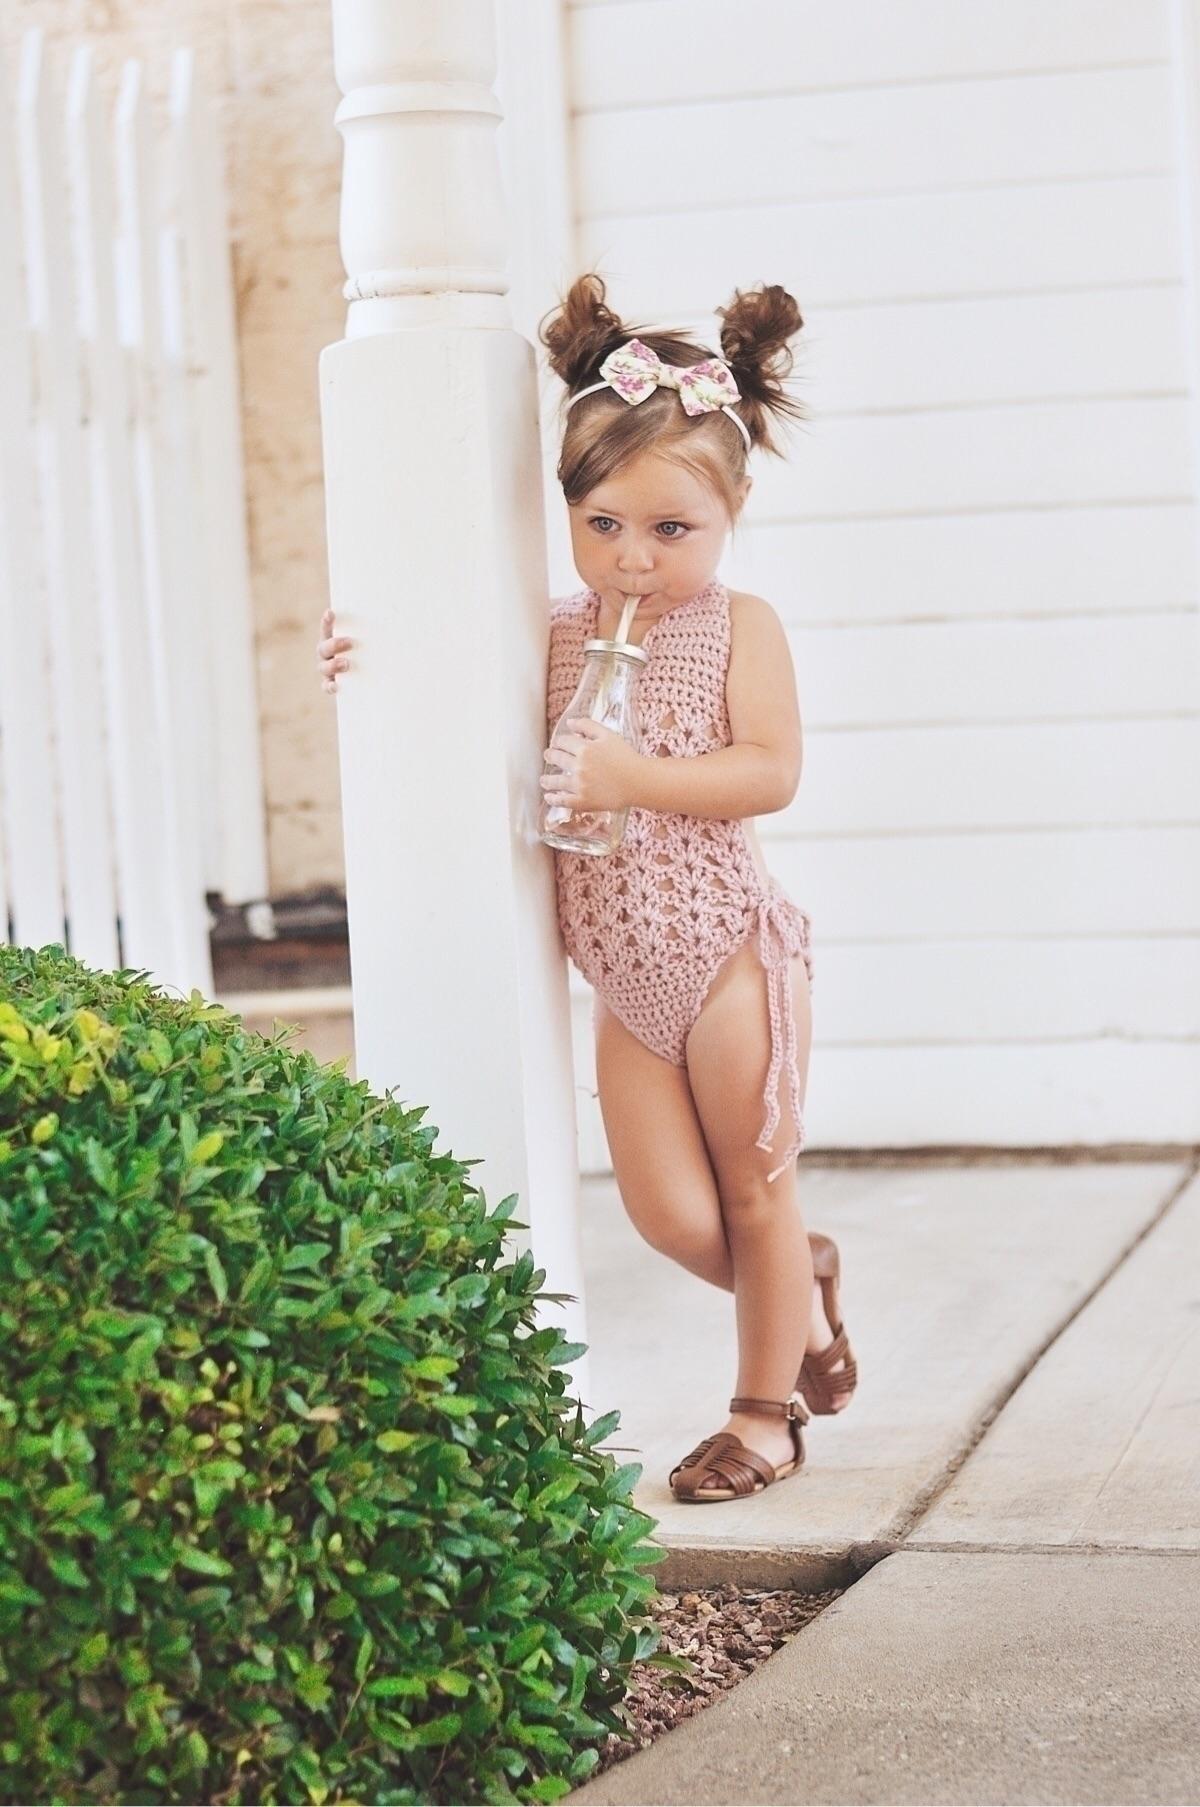 Crochet bathing suits shop!!  - etsy - bitsybabyshop | ello